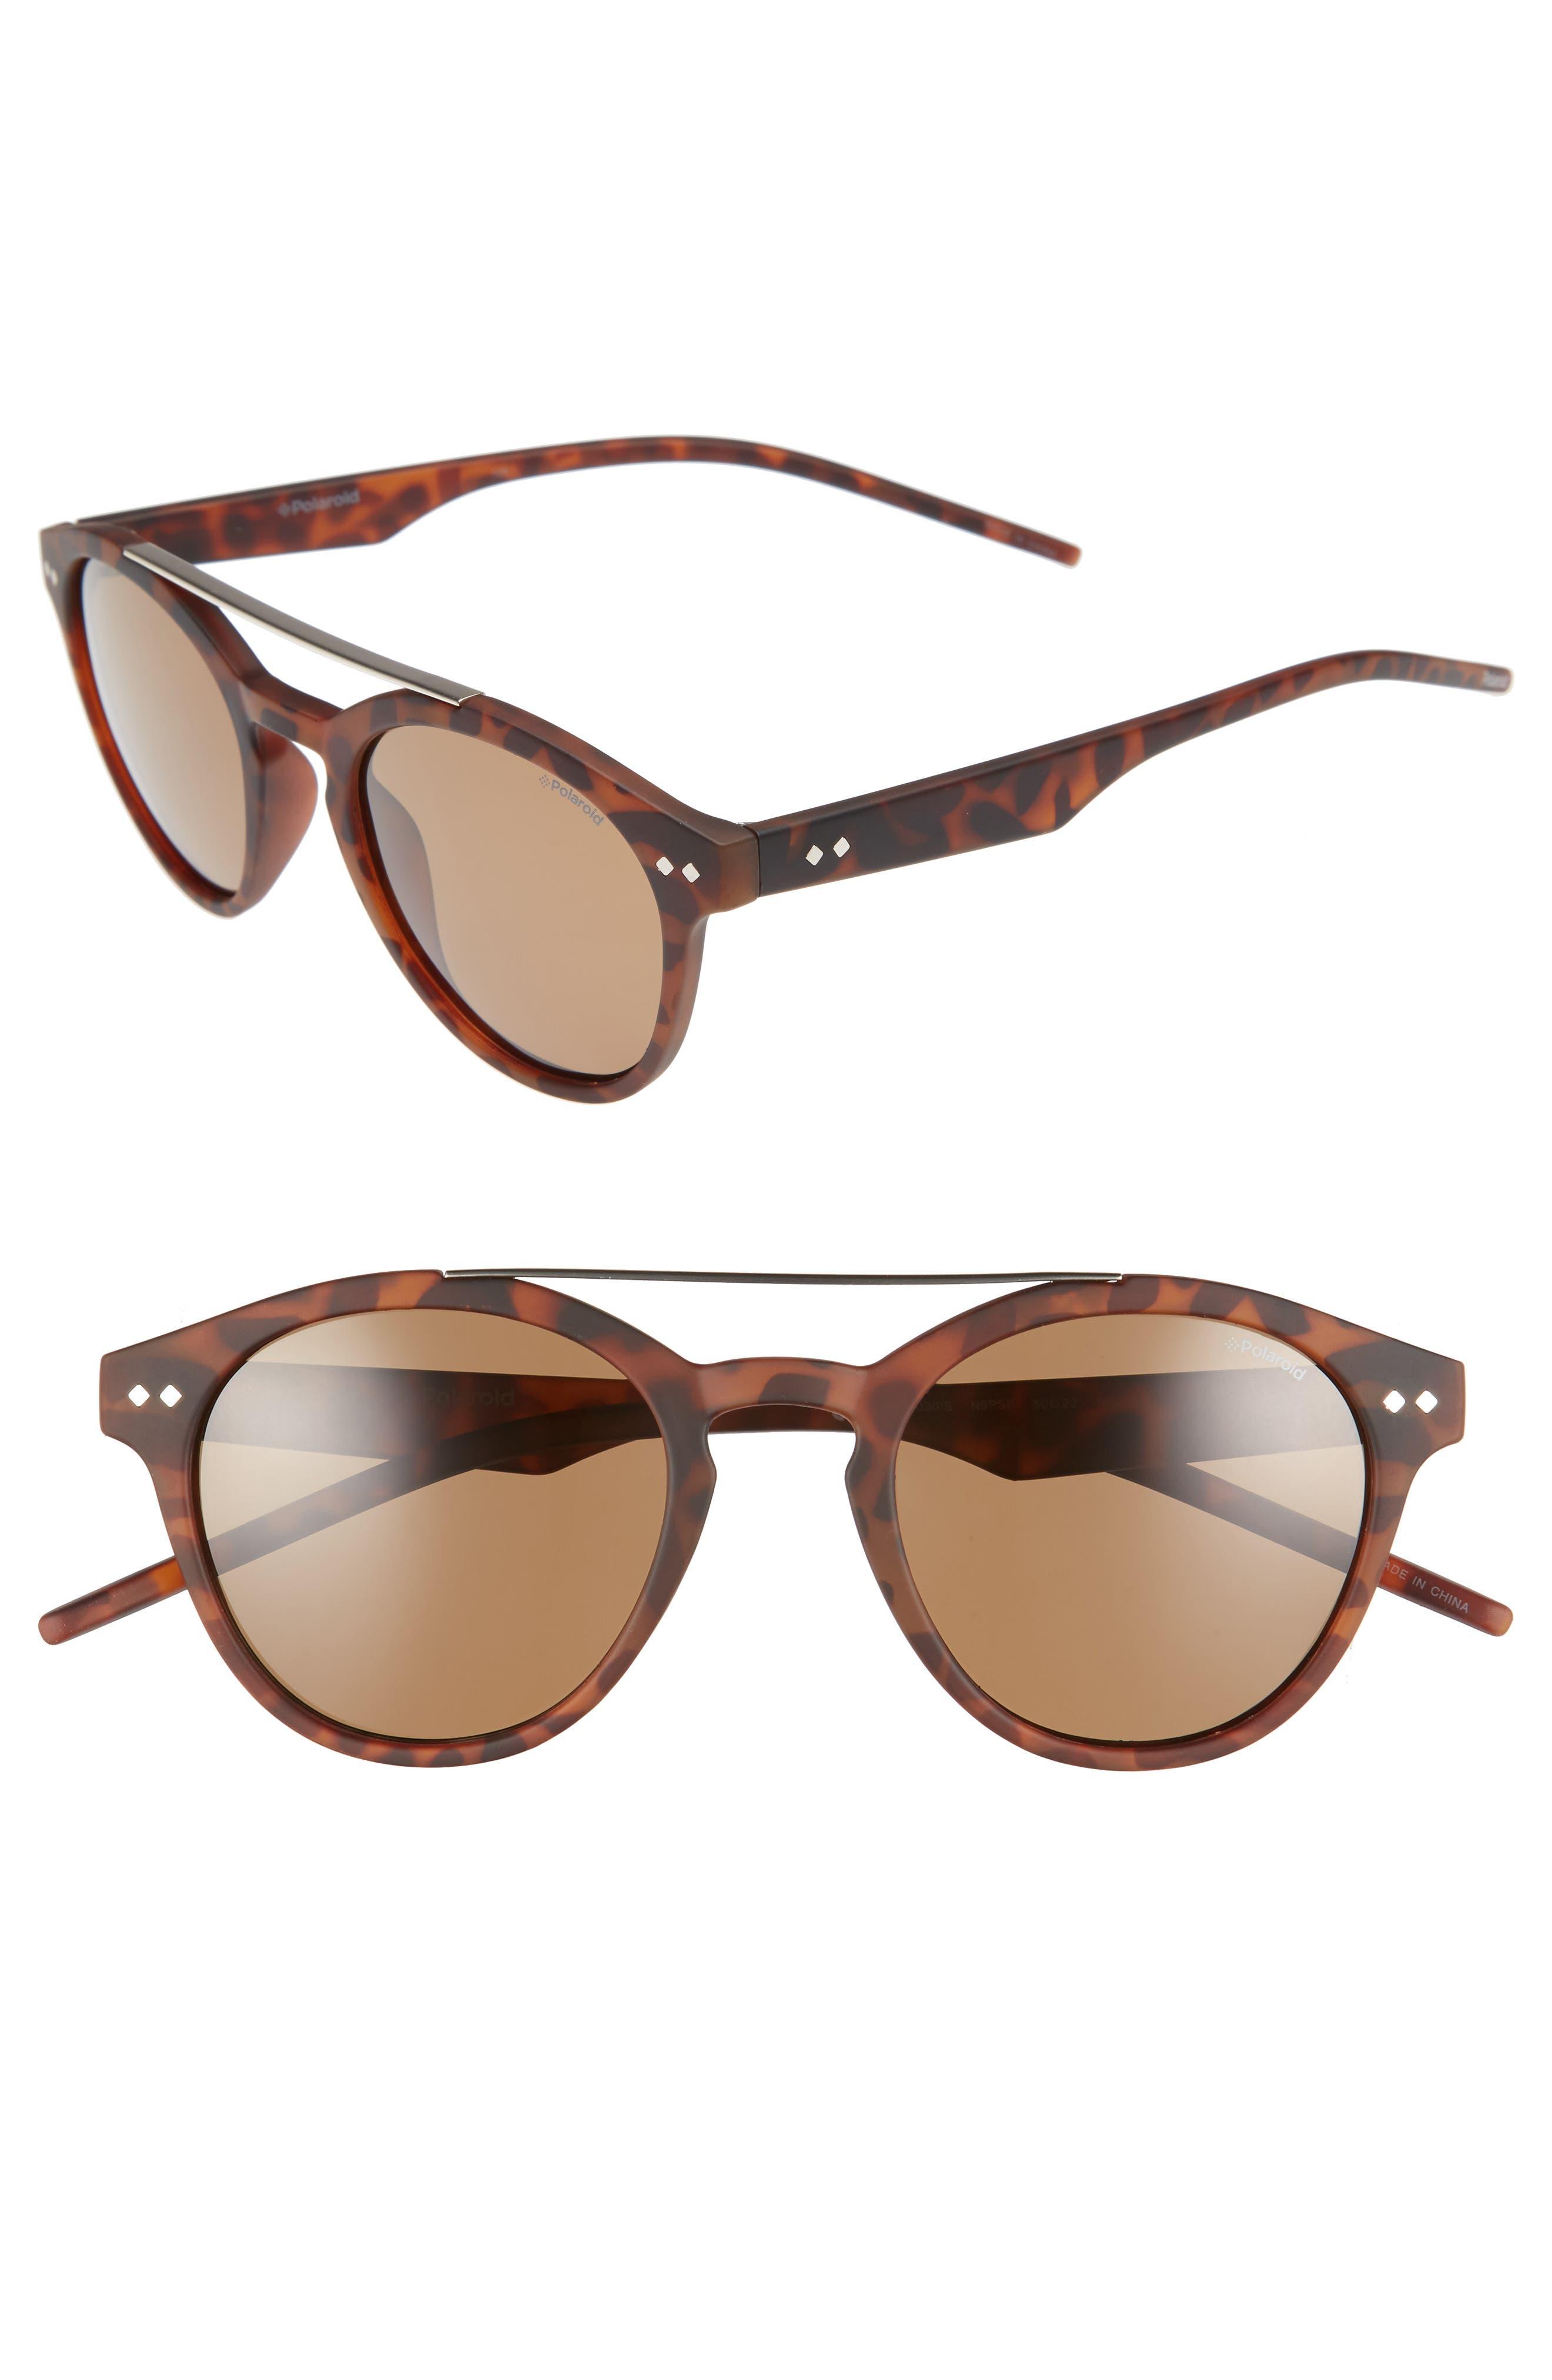 50mm Polarized Retro Sunglasses,                             Main thumbnail 2, color,